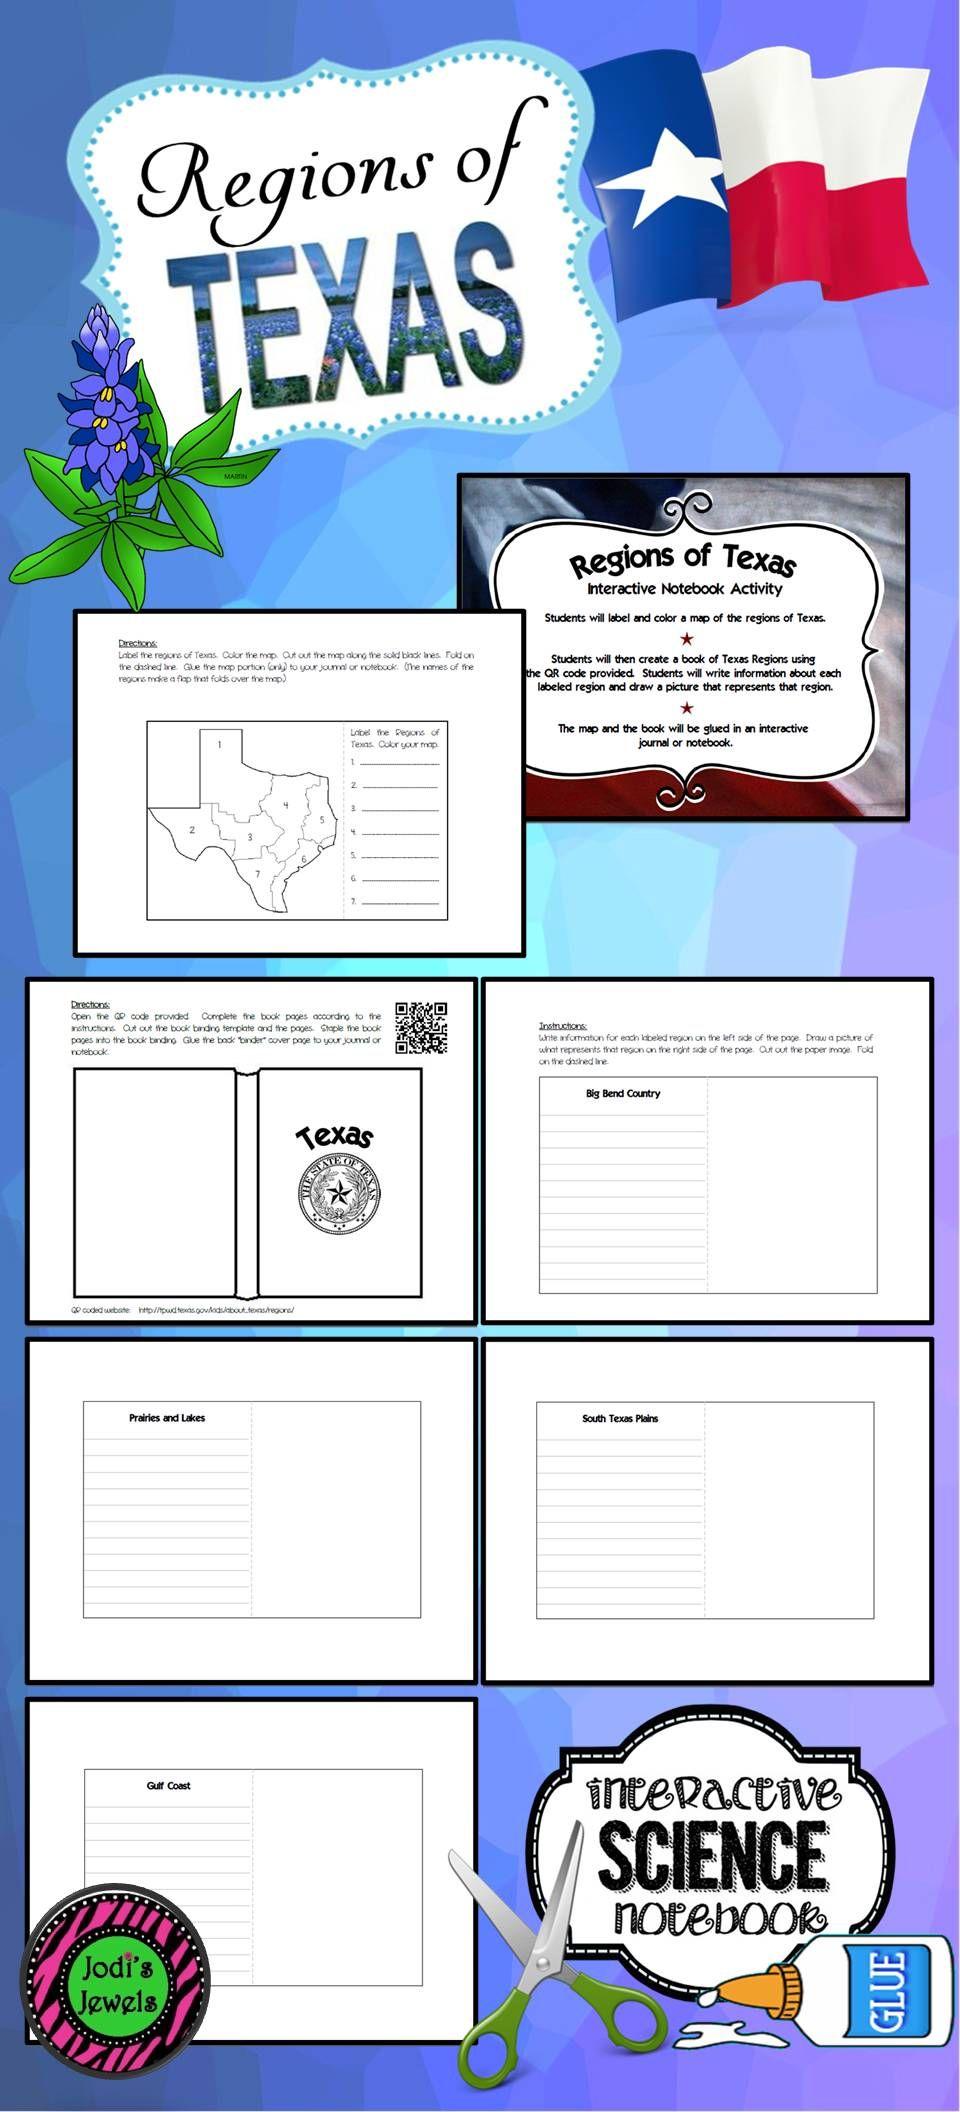 Complete Map Of Texas.Regions Of Texas Interactive Notebook Activity Homeschool Map